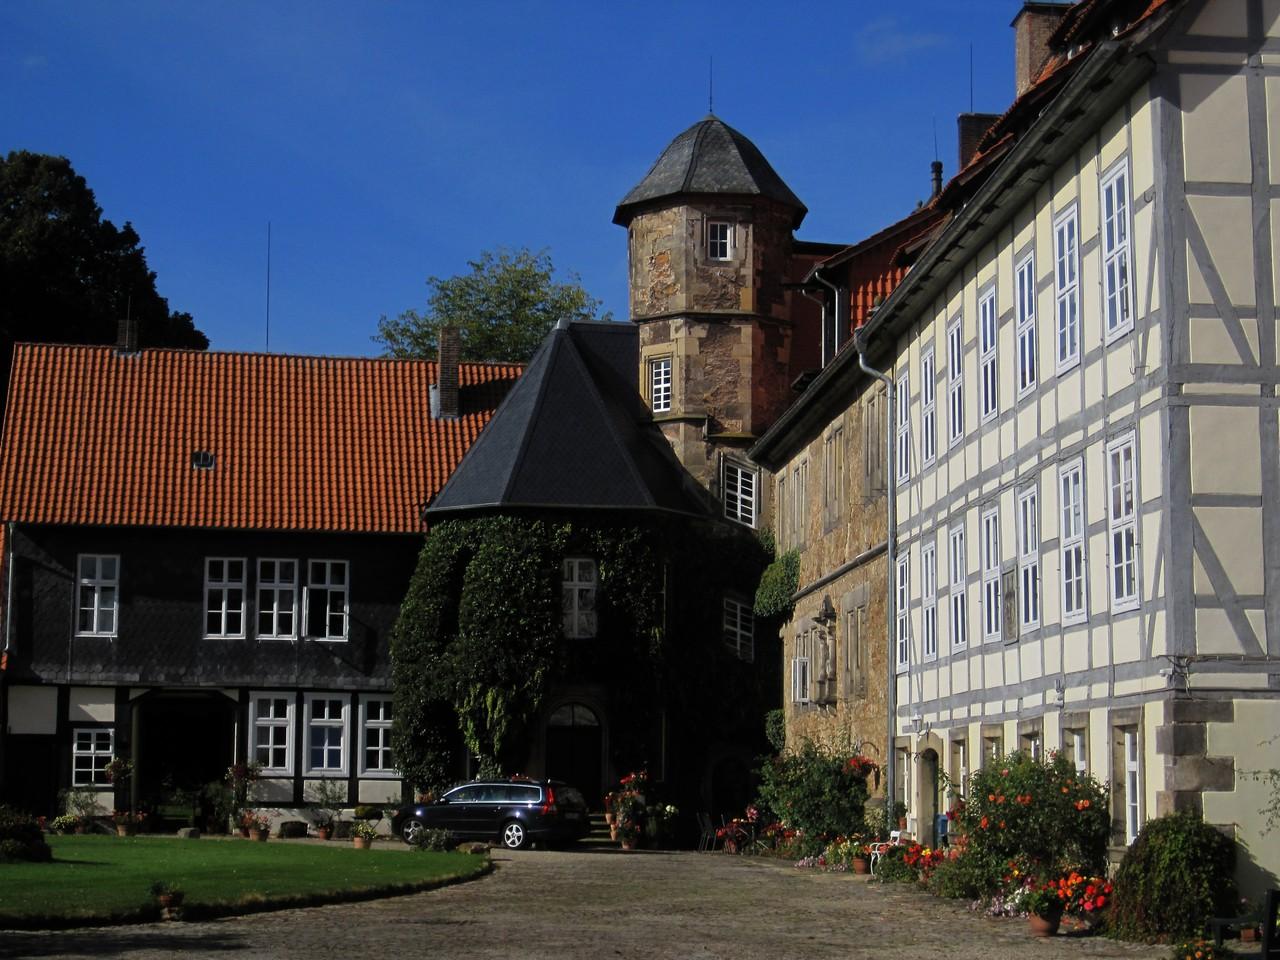 Wasserschloss Münchhausen in Apelern